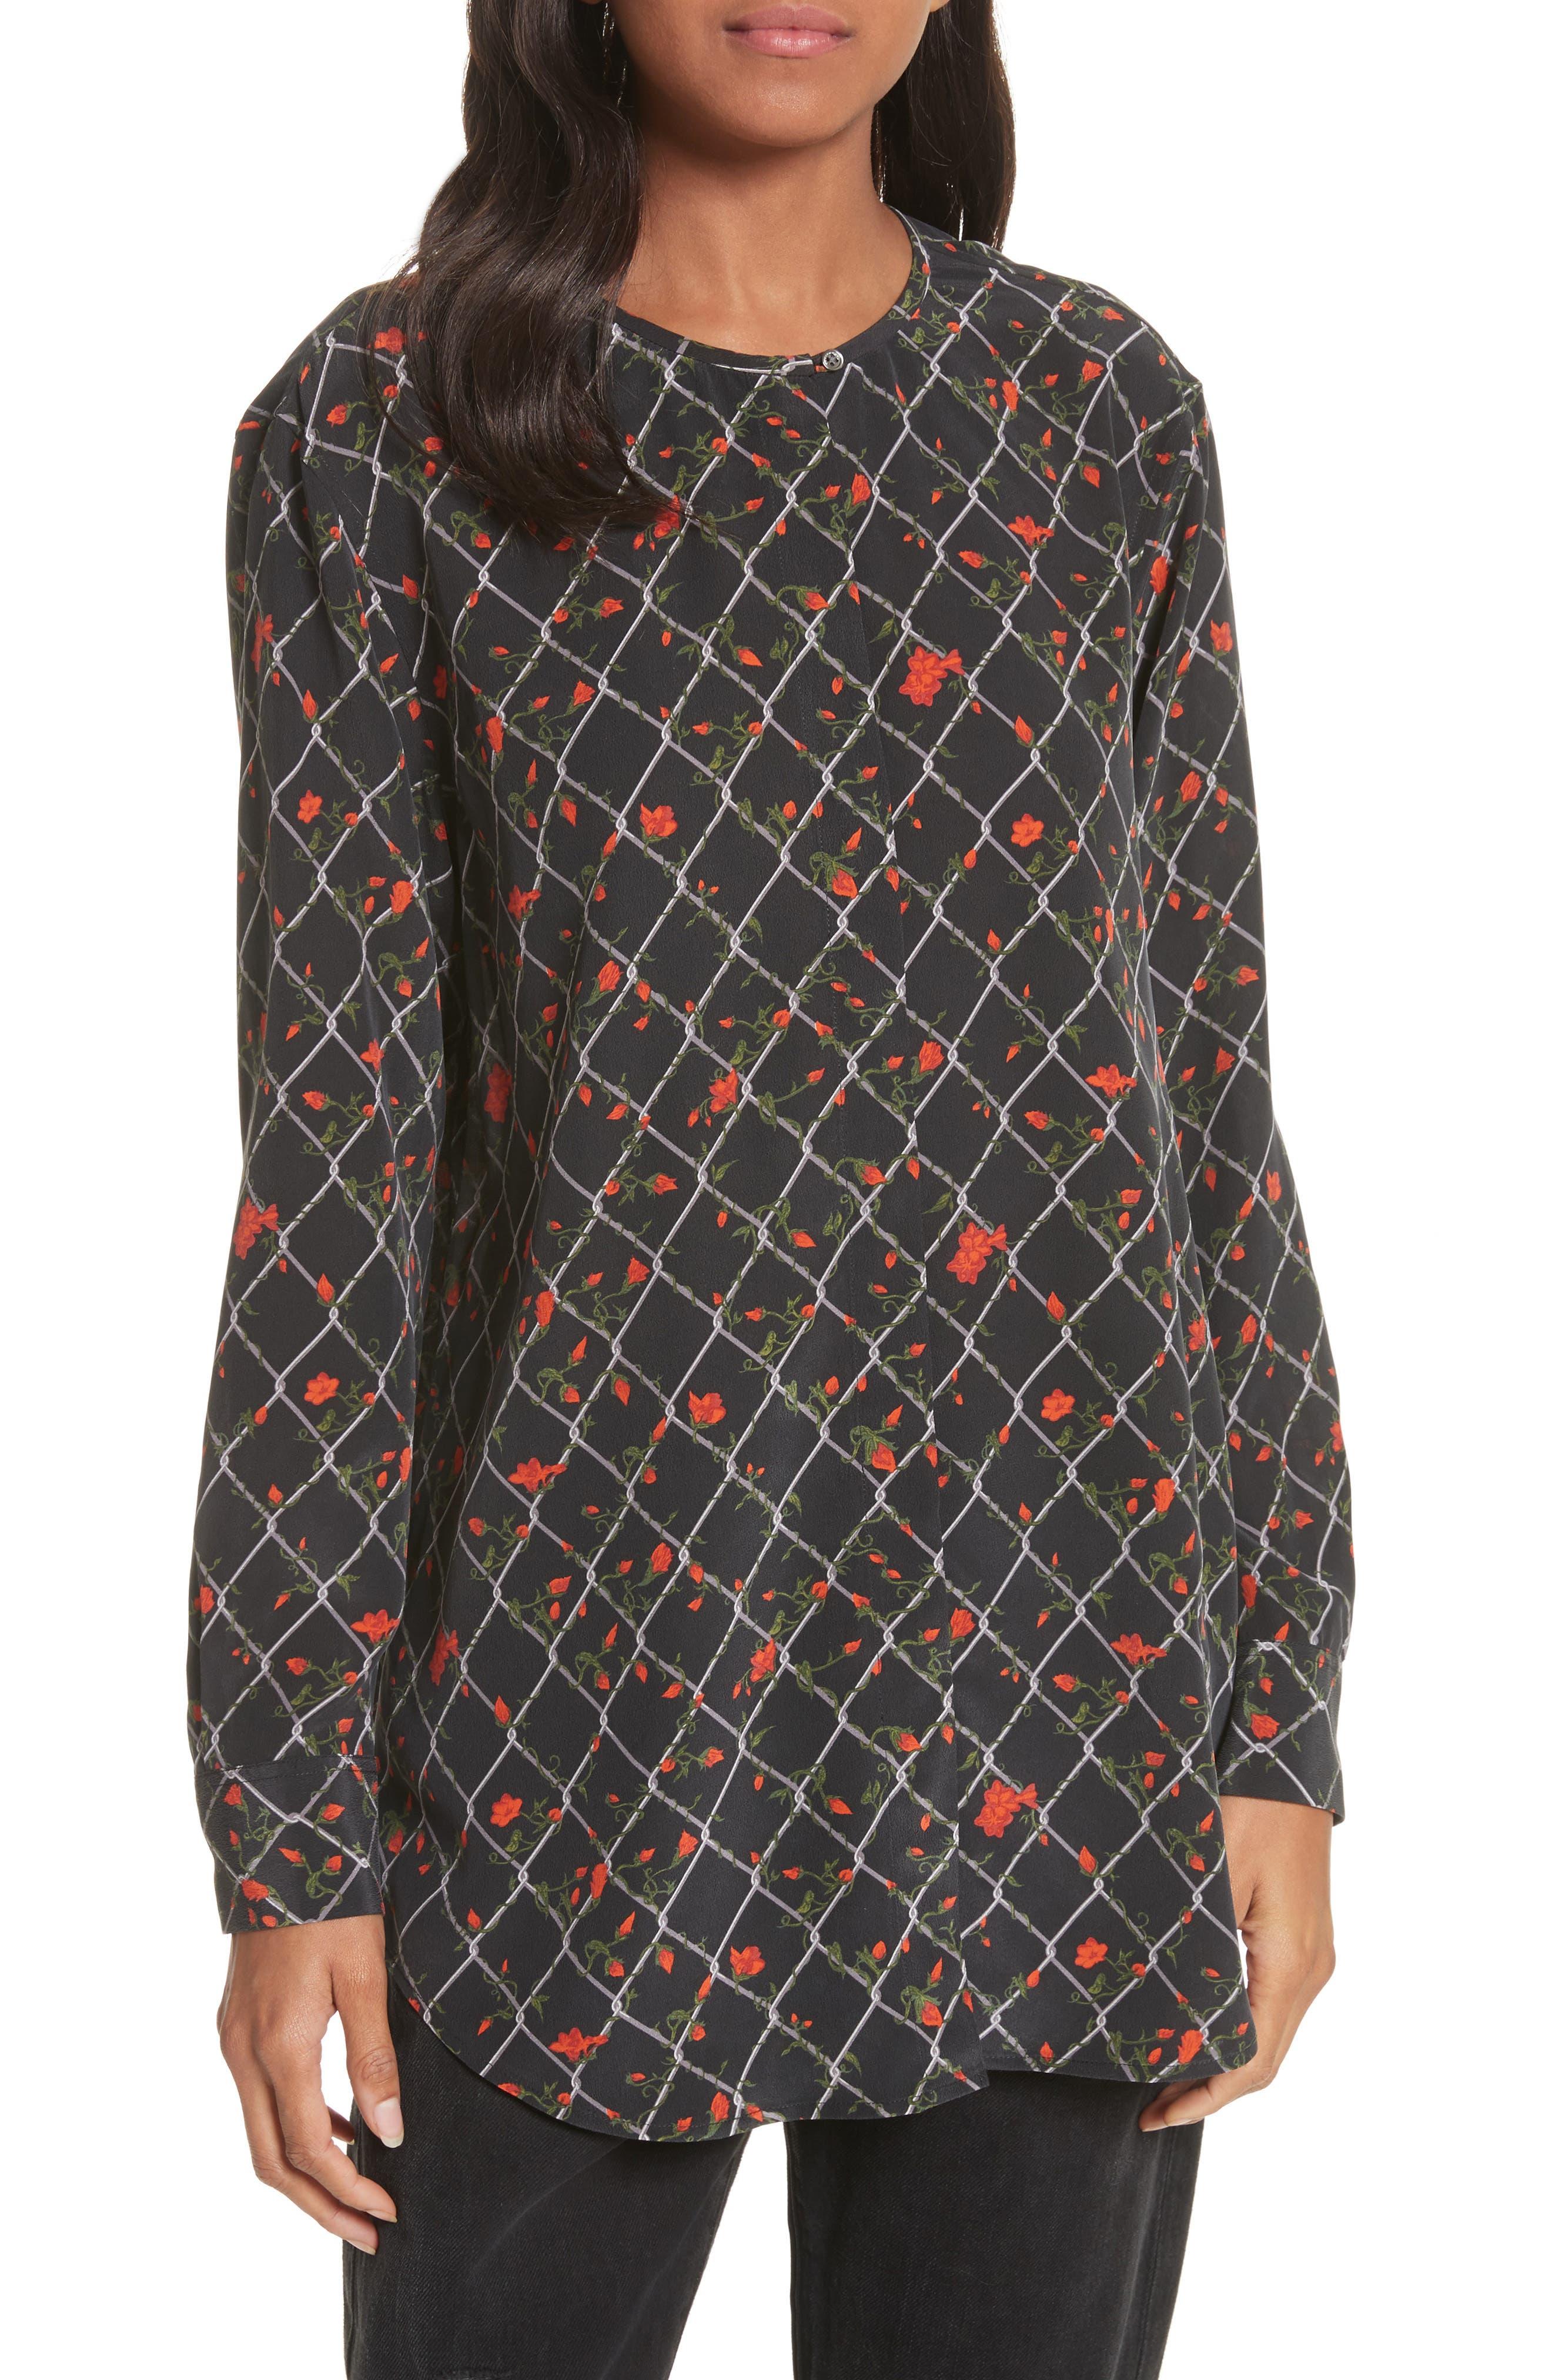 Simon Print Silk Blouse,                         Main,                         color, True Black Multi